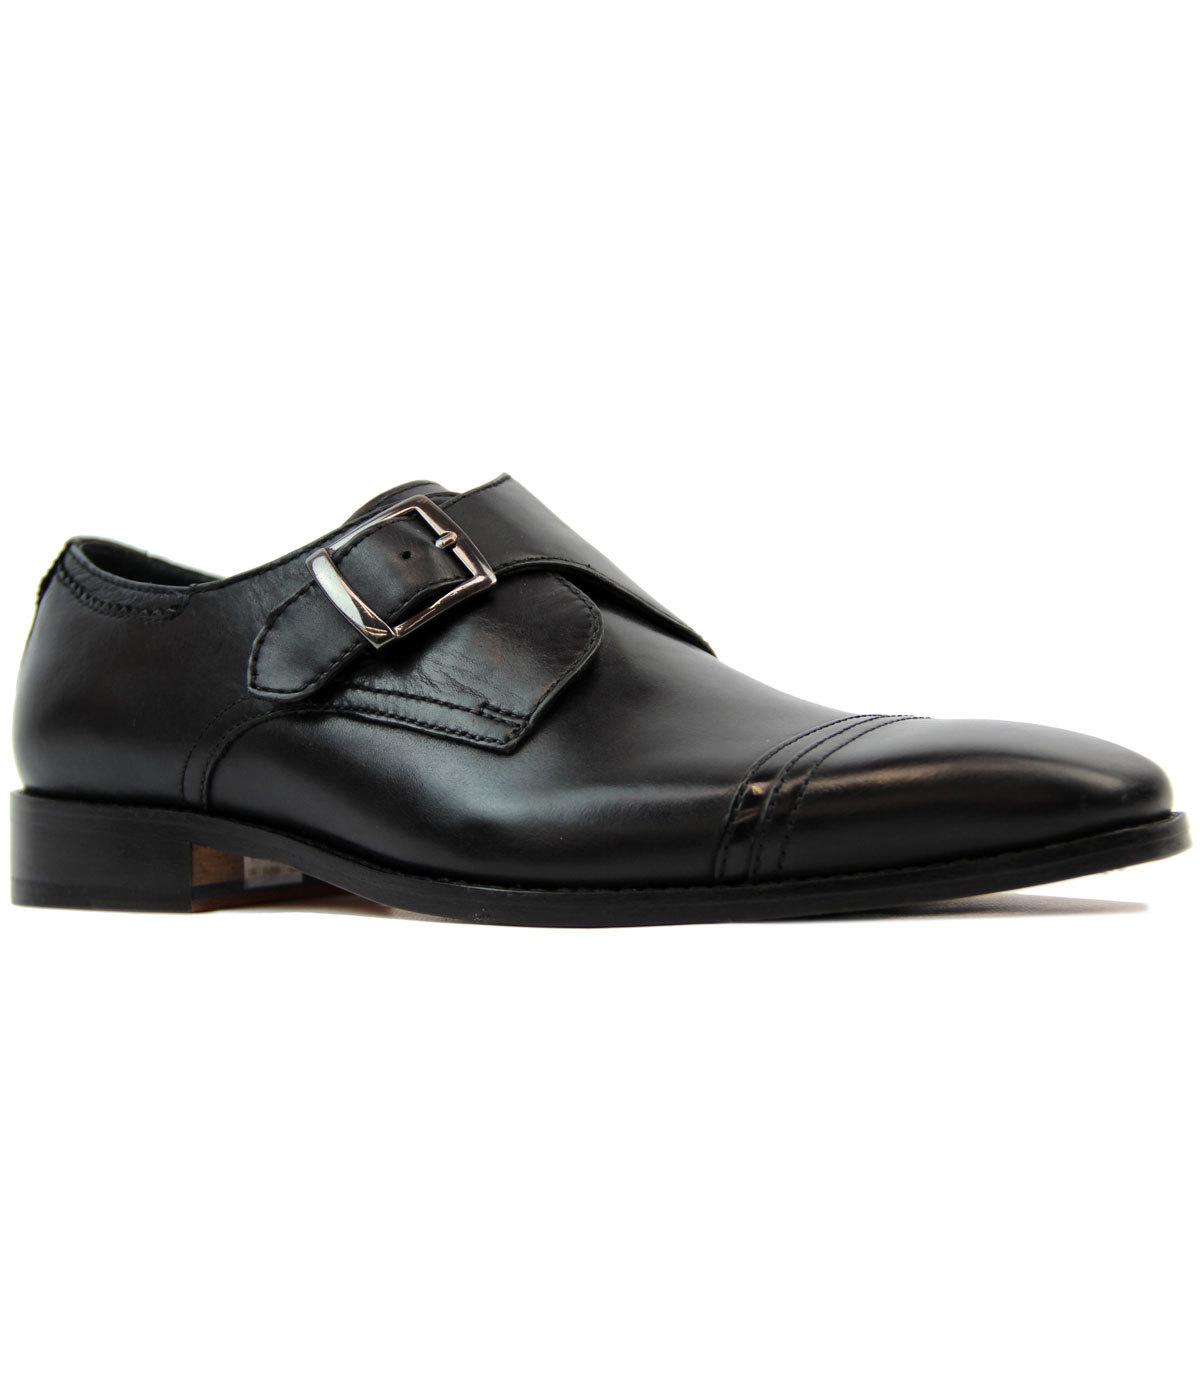 Sawley GOODWIN SMITH Retro Mod Monk Strap Shoes